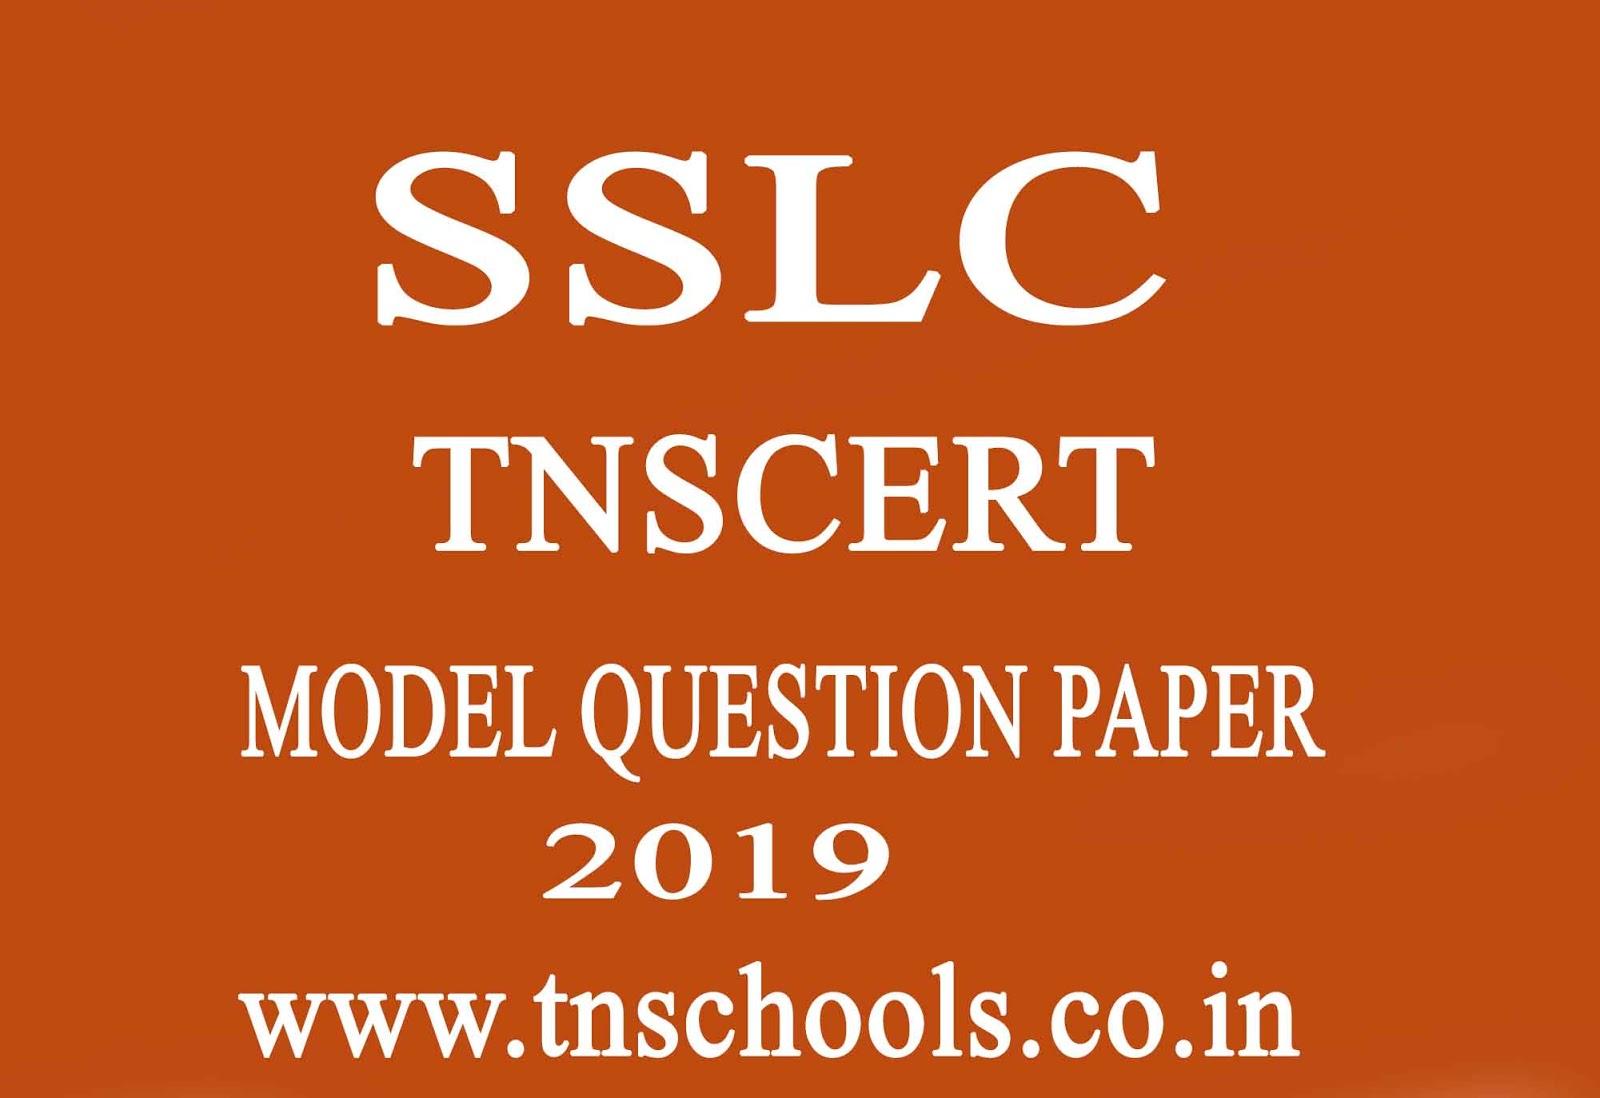 tnscert 10th Standard ( SSLC) Model question paper 2019